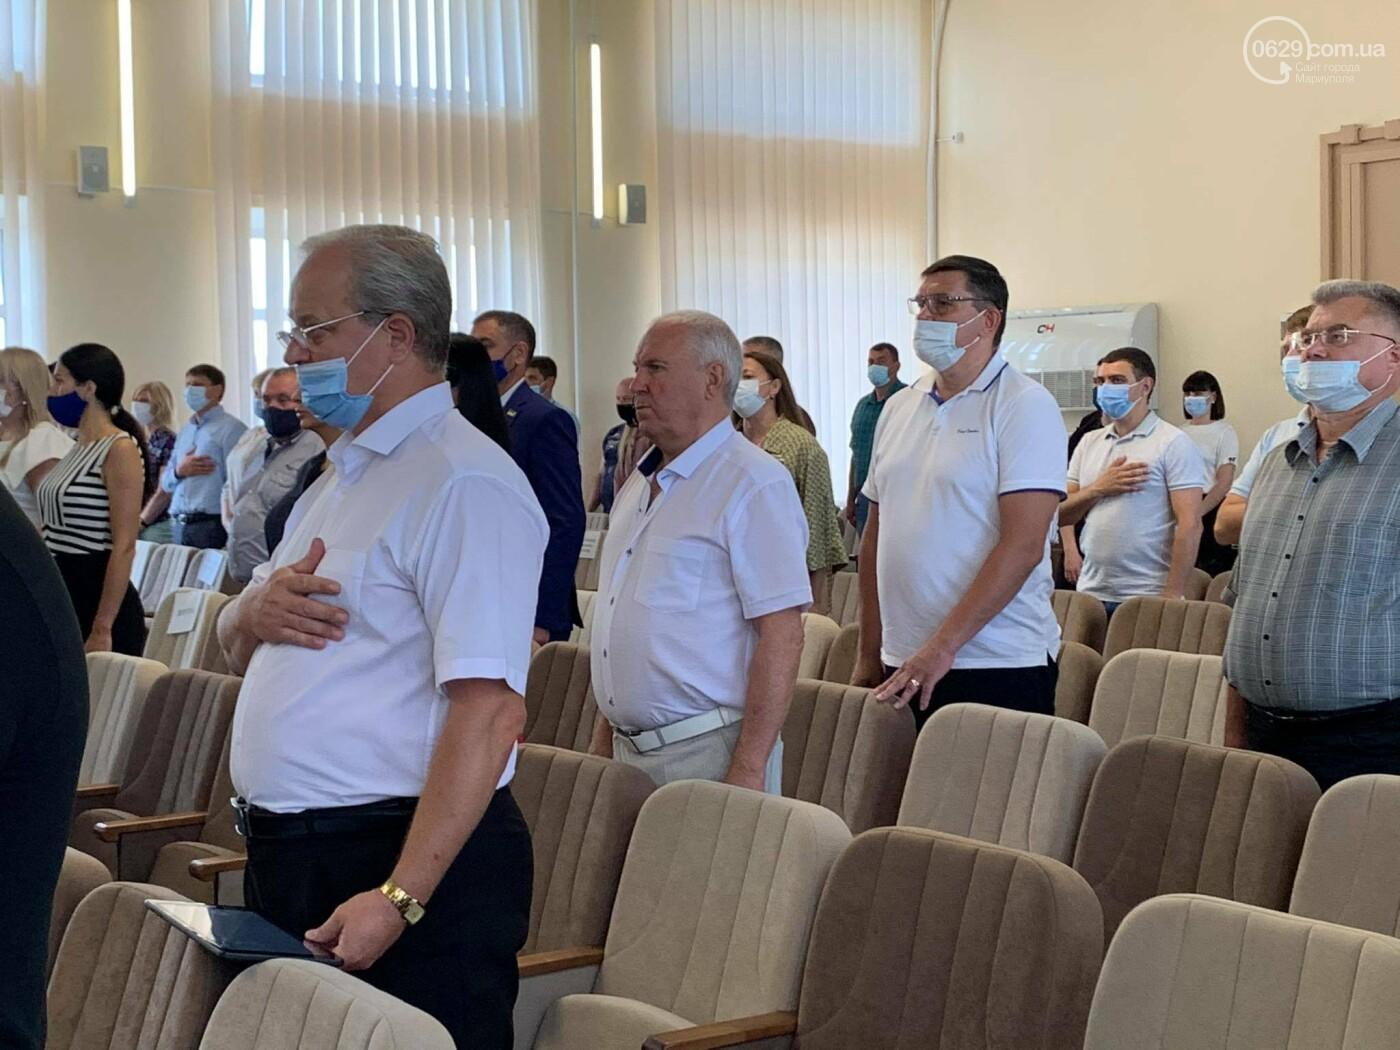 В Мариуполе стартовала сессия горсовета, - ФОТО, фото-4